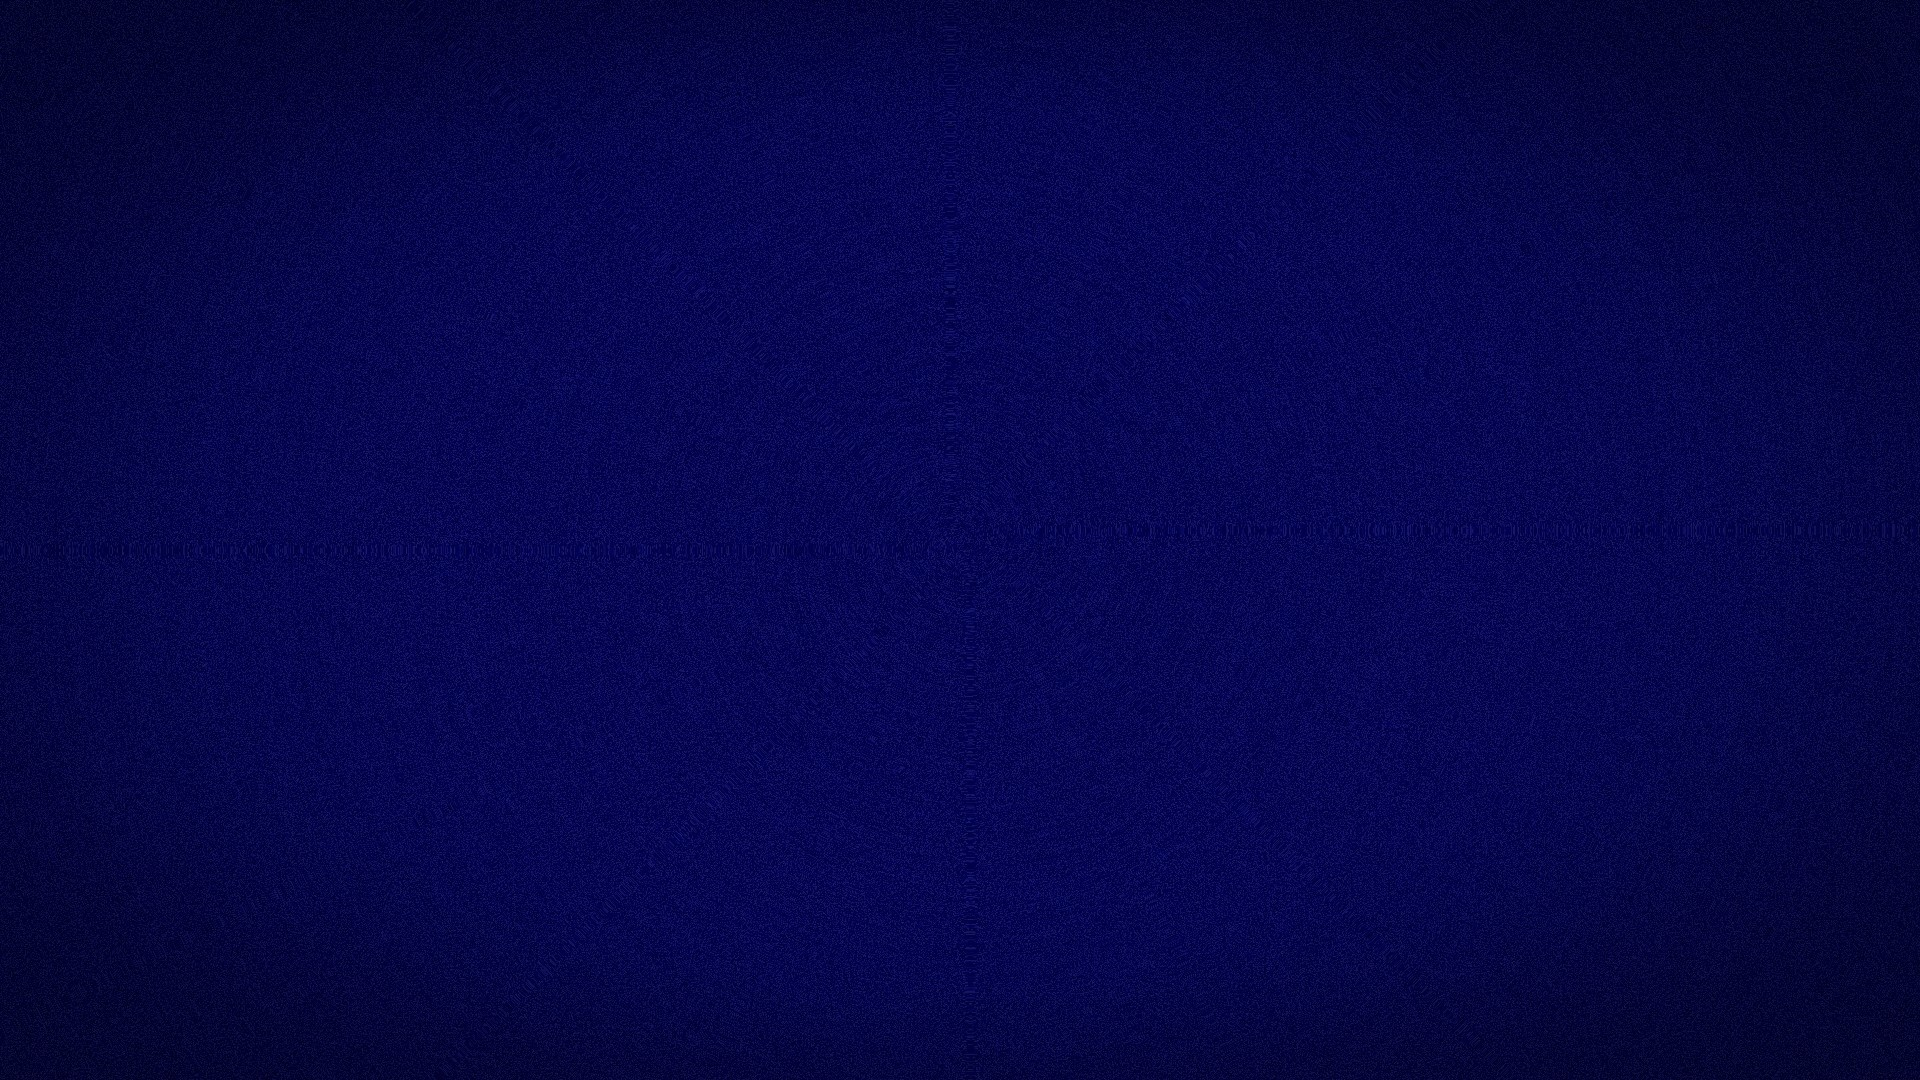 Solid Black Wallpaper 1920x1080 ·①